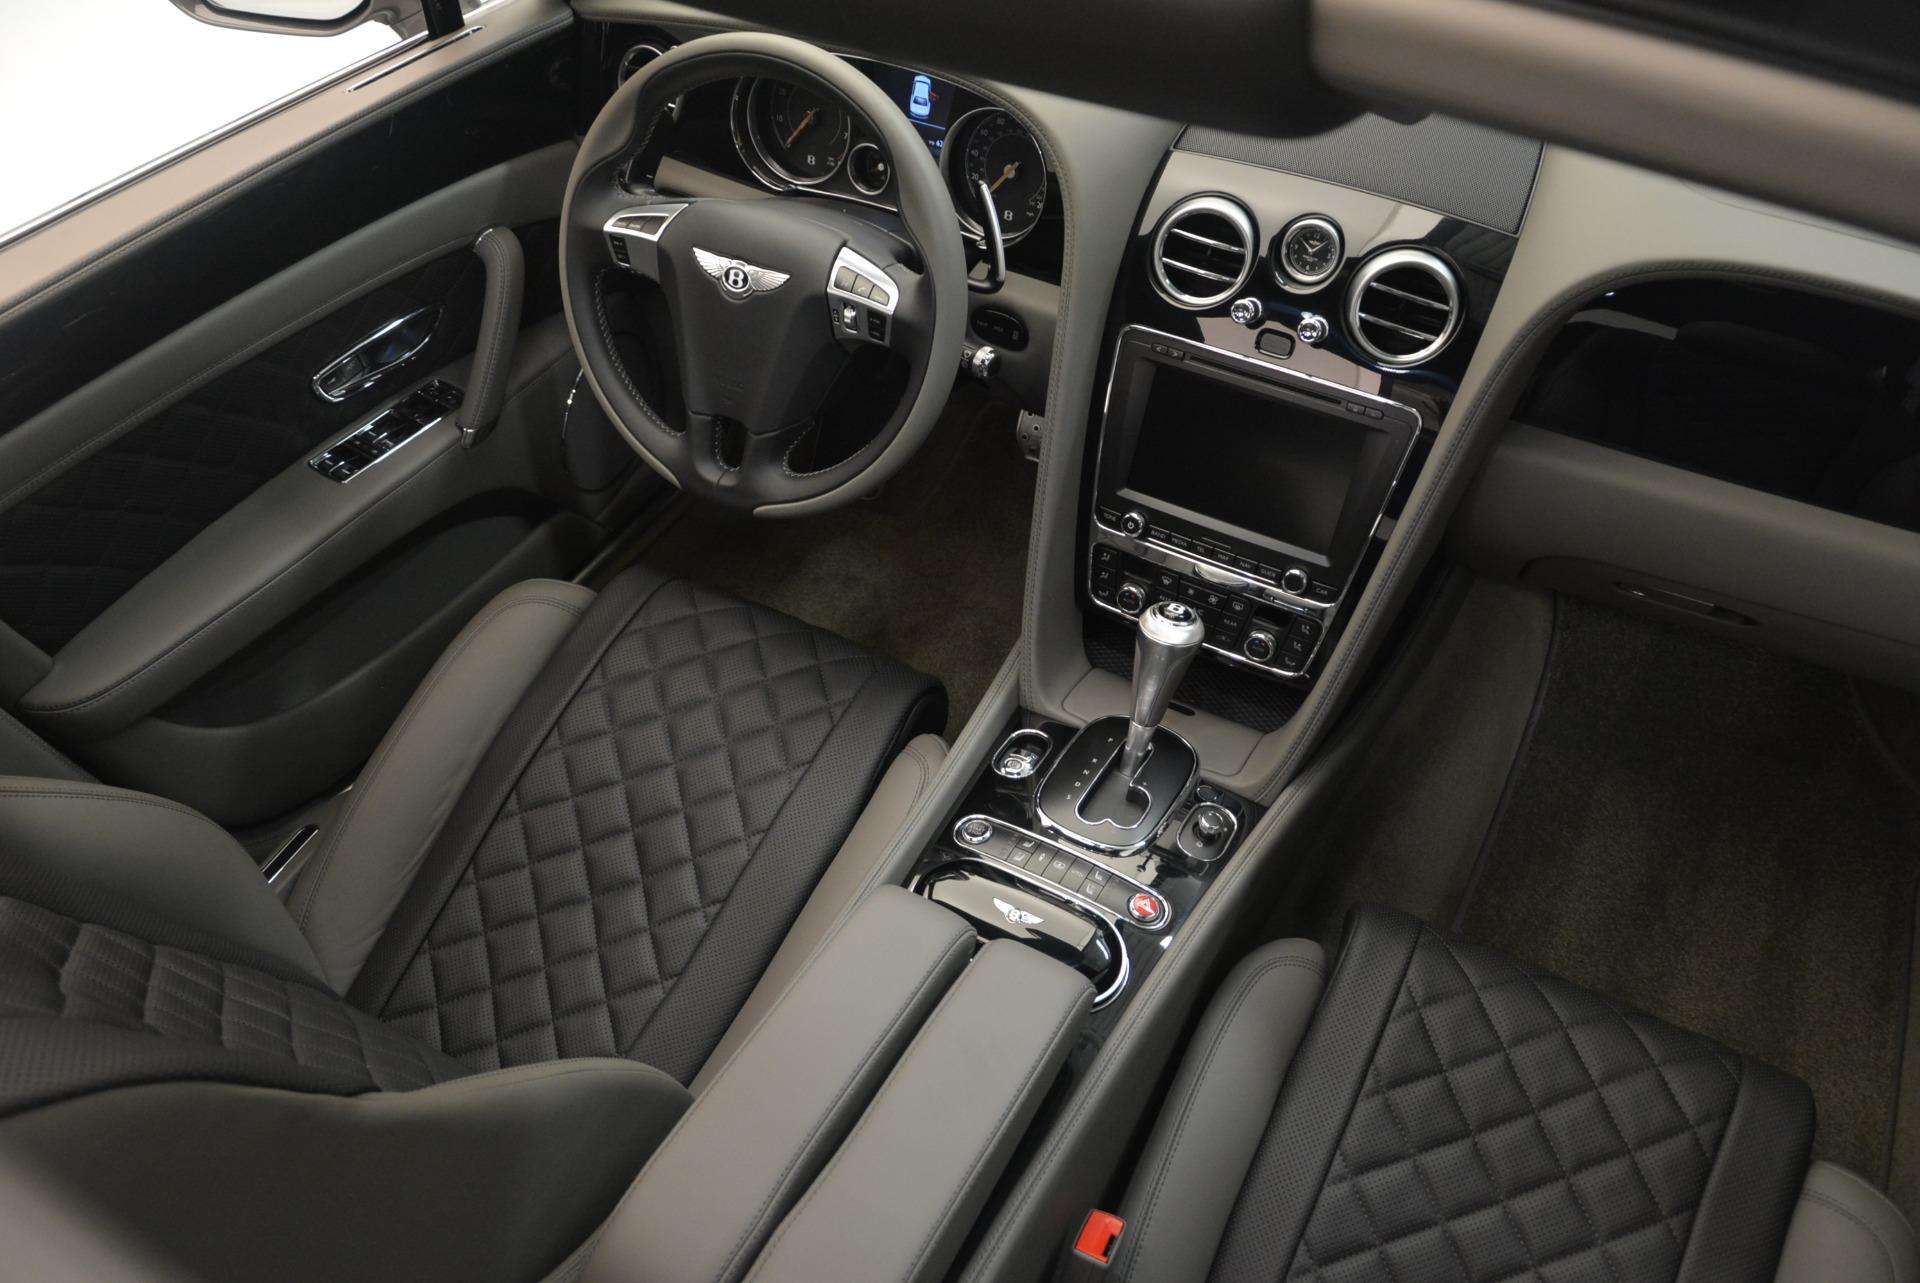 Used 2017 Bentley Flying Spur V8 S For Sale In Westport, CT 2263_p26